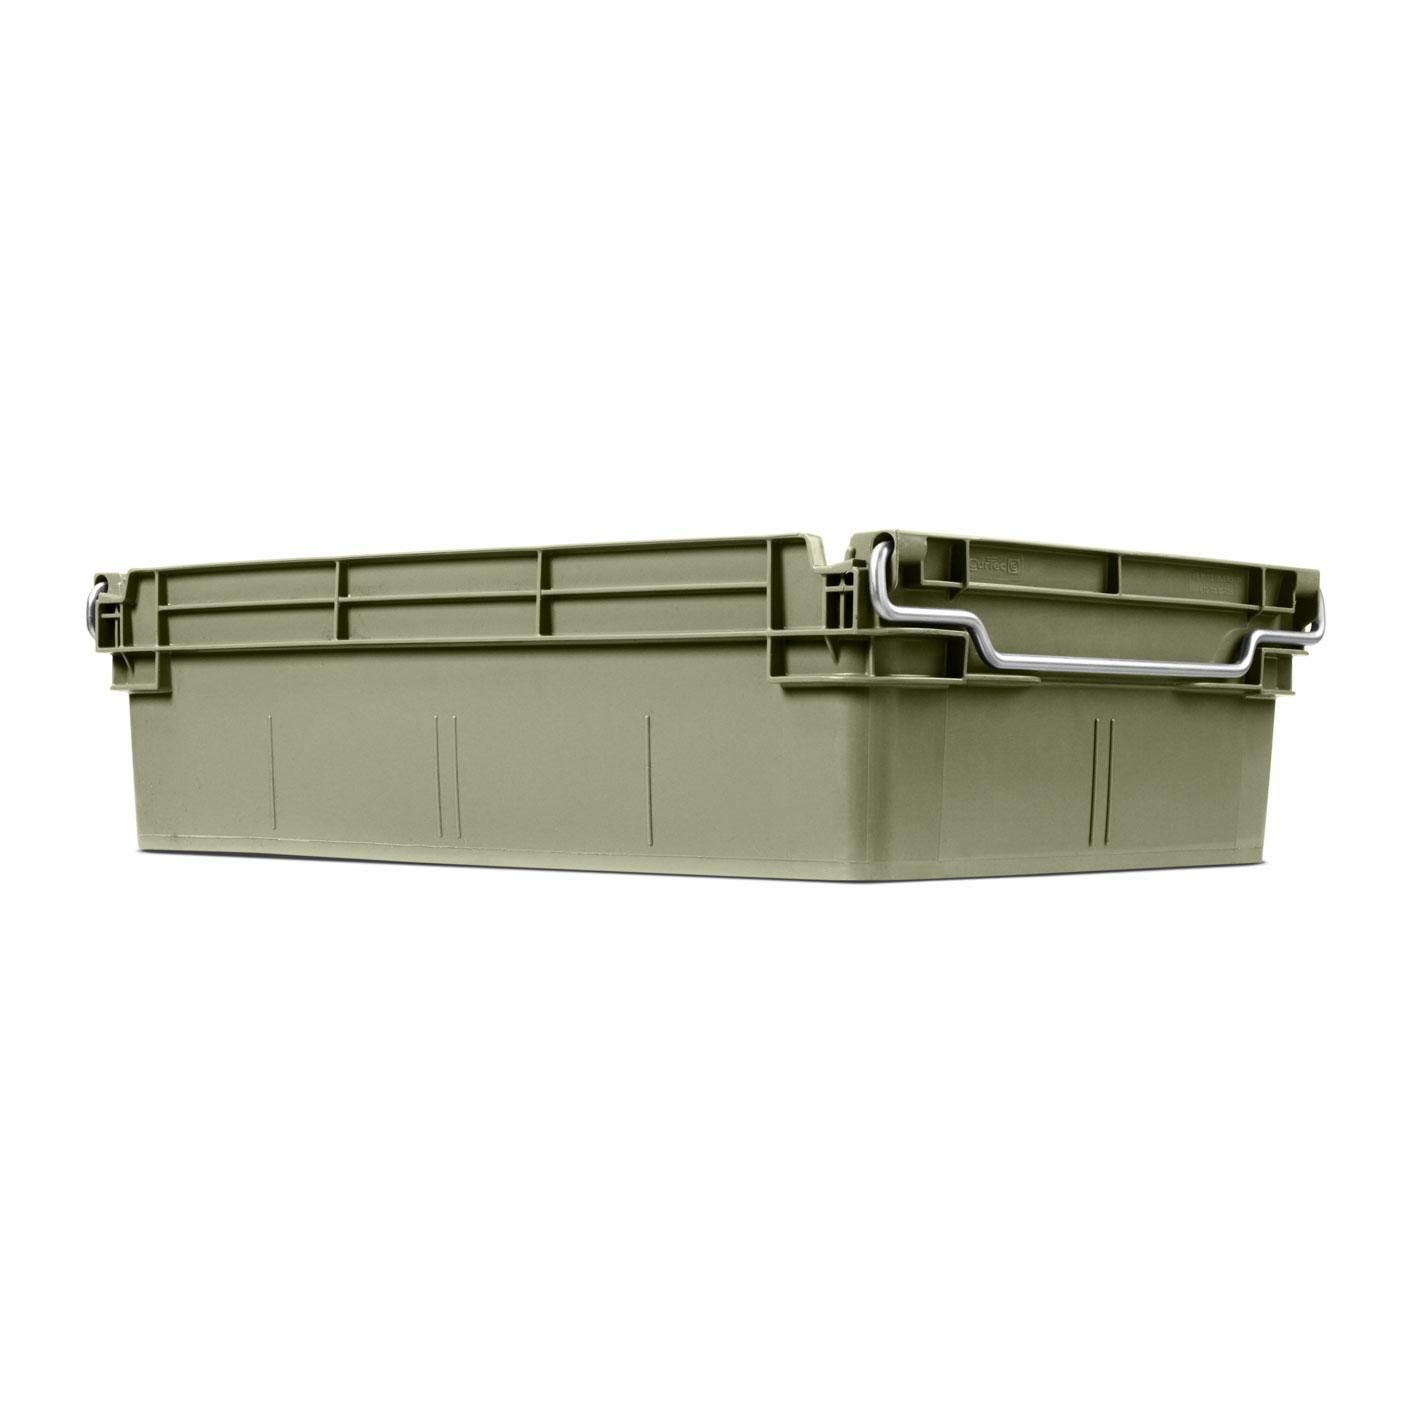 30 litre swingbar crate